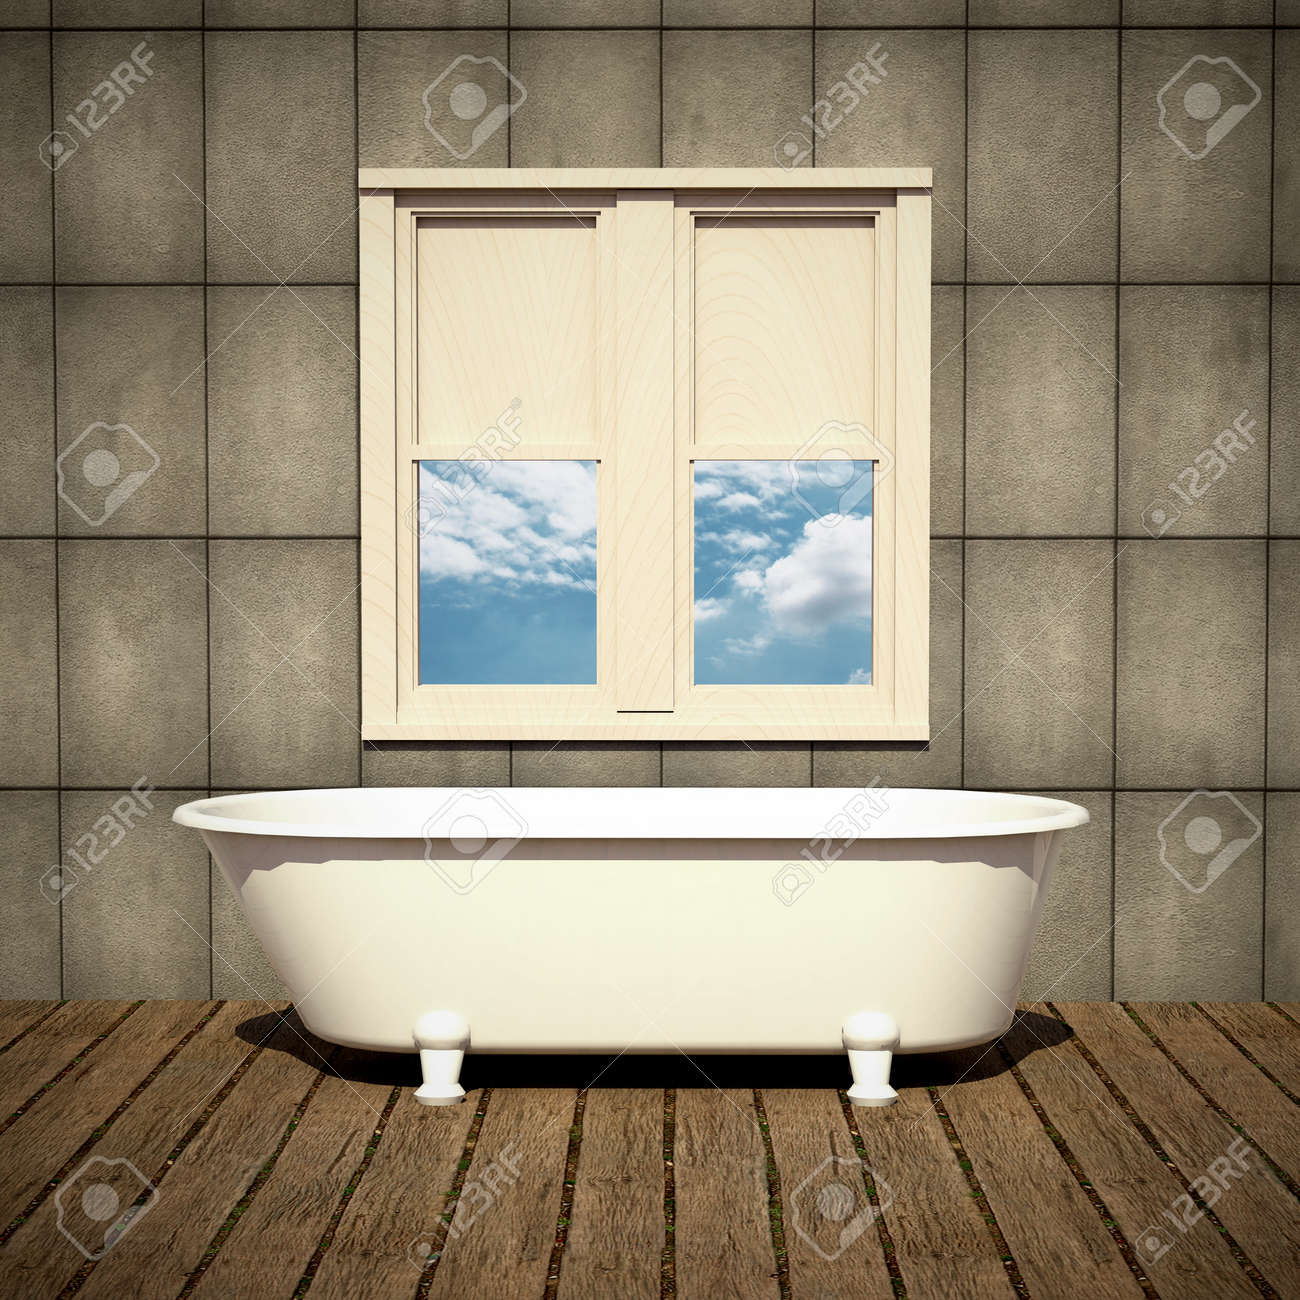 Minimalist Bathtub In A Retro Bathroom With Plank Wood Floor Stock ...